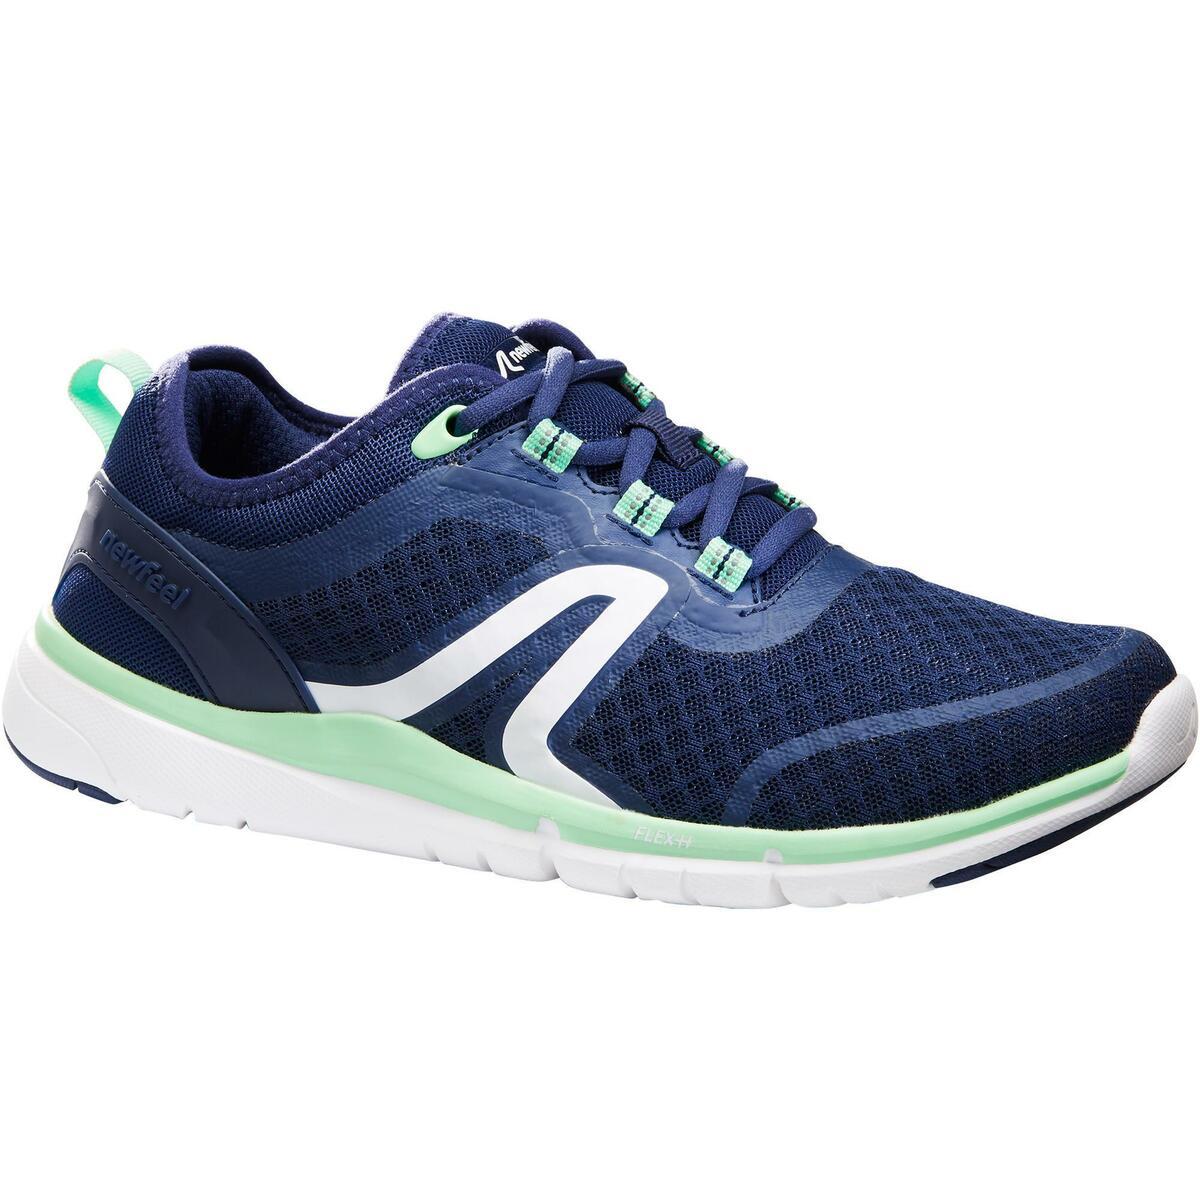 Bild 1 von Walkingschuhe Soft 540 Mesh Damen marineblau/grün